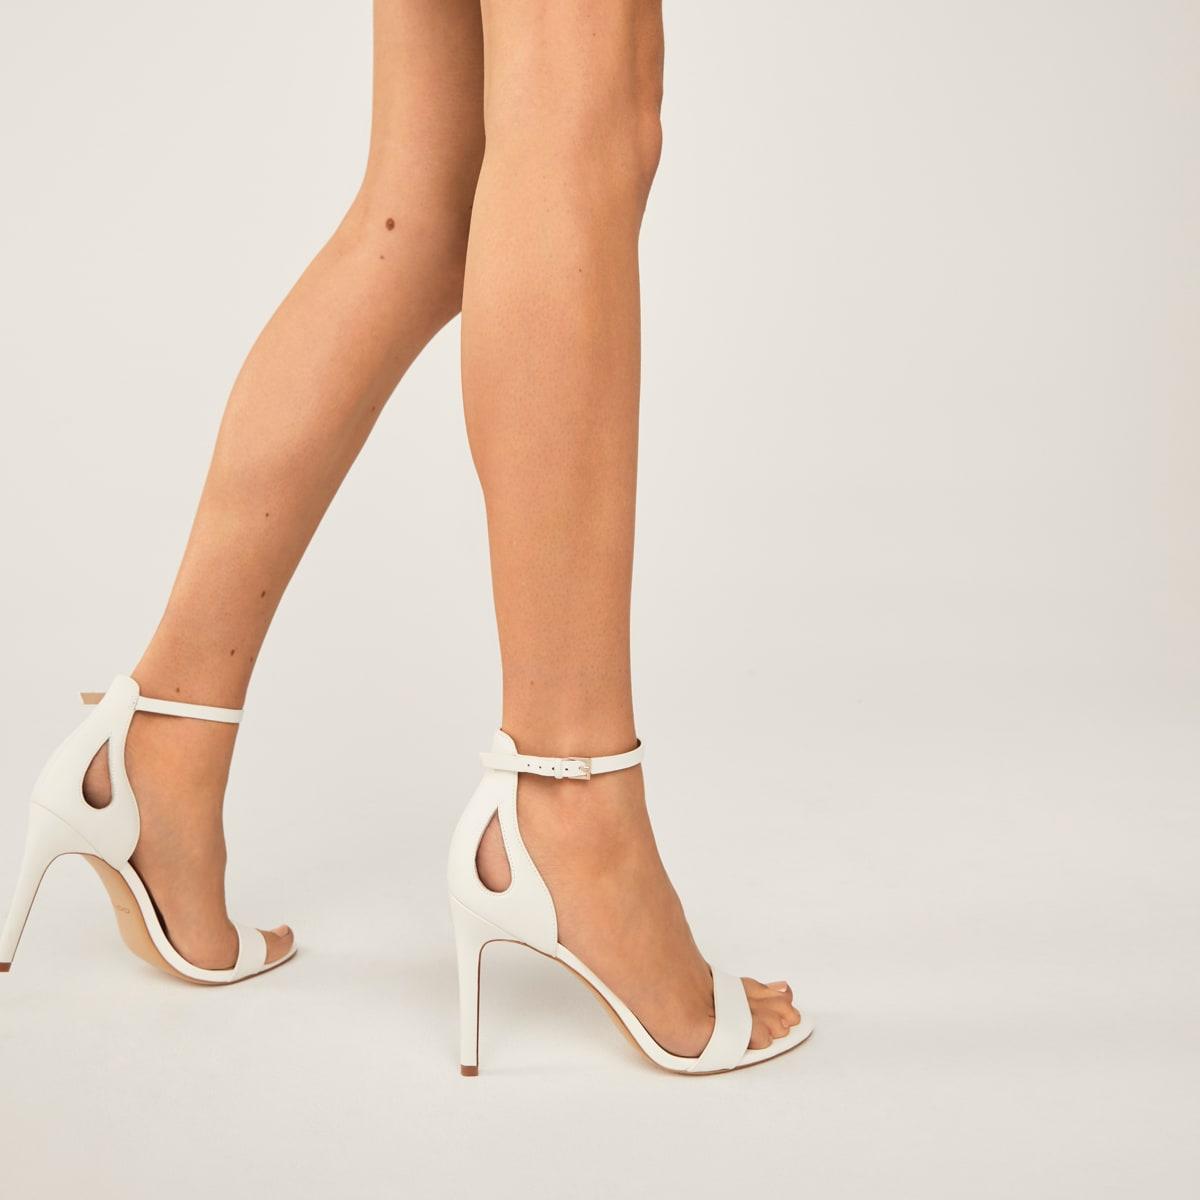 Violla White Women's High heels   ALDO UK